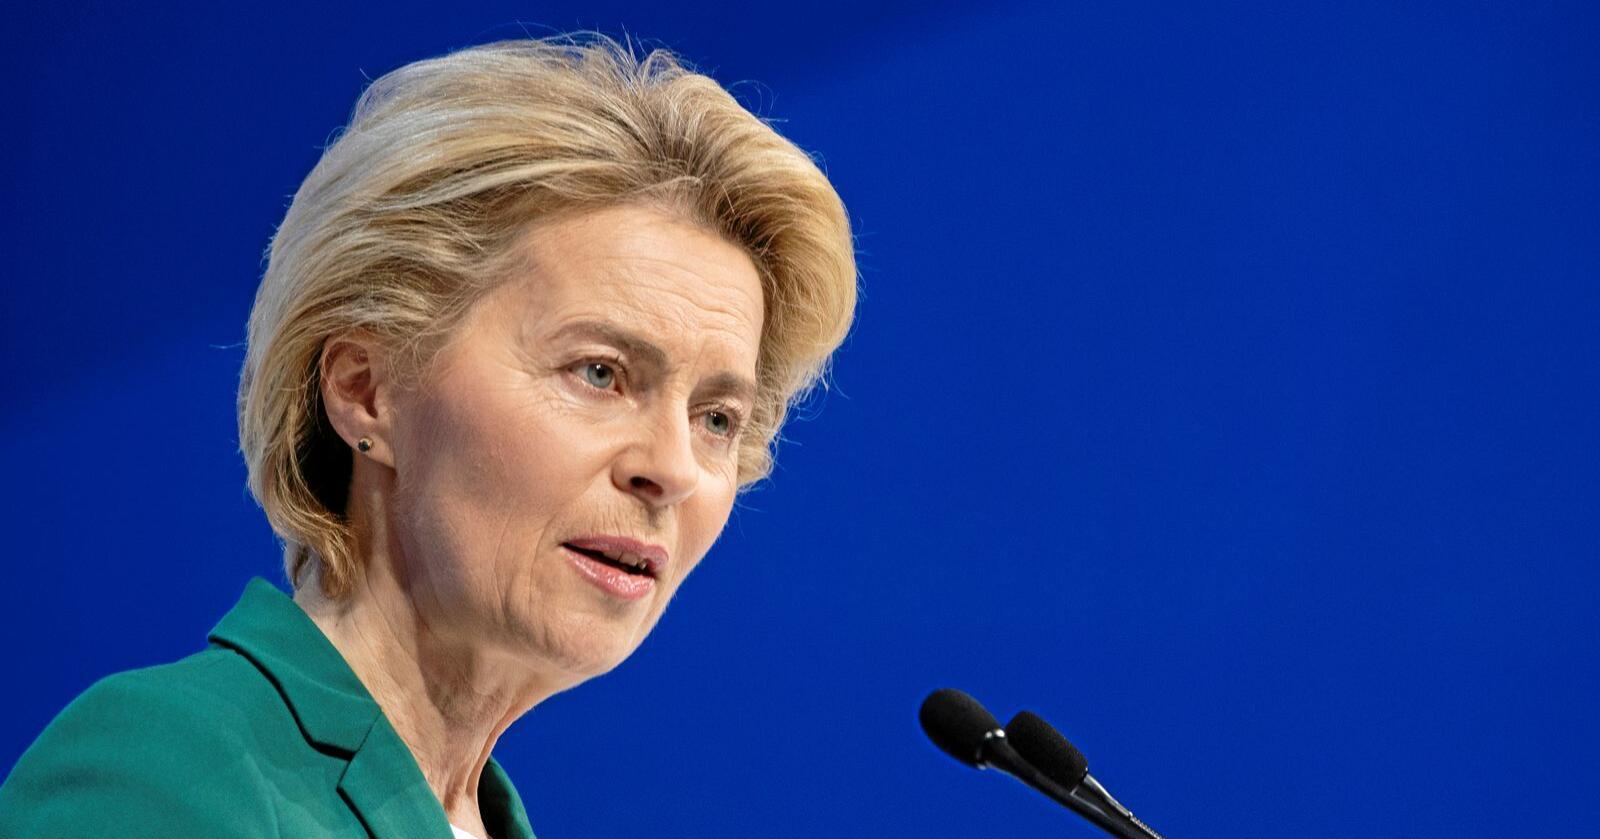 Green Deal: Ursula von der Leyen, President i Europakommisjonen la i desember i fjor fram EUs Green Deal. Foto: AP / NTB scanpix